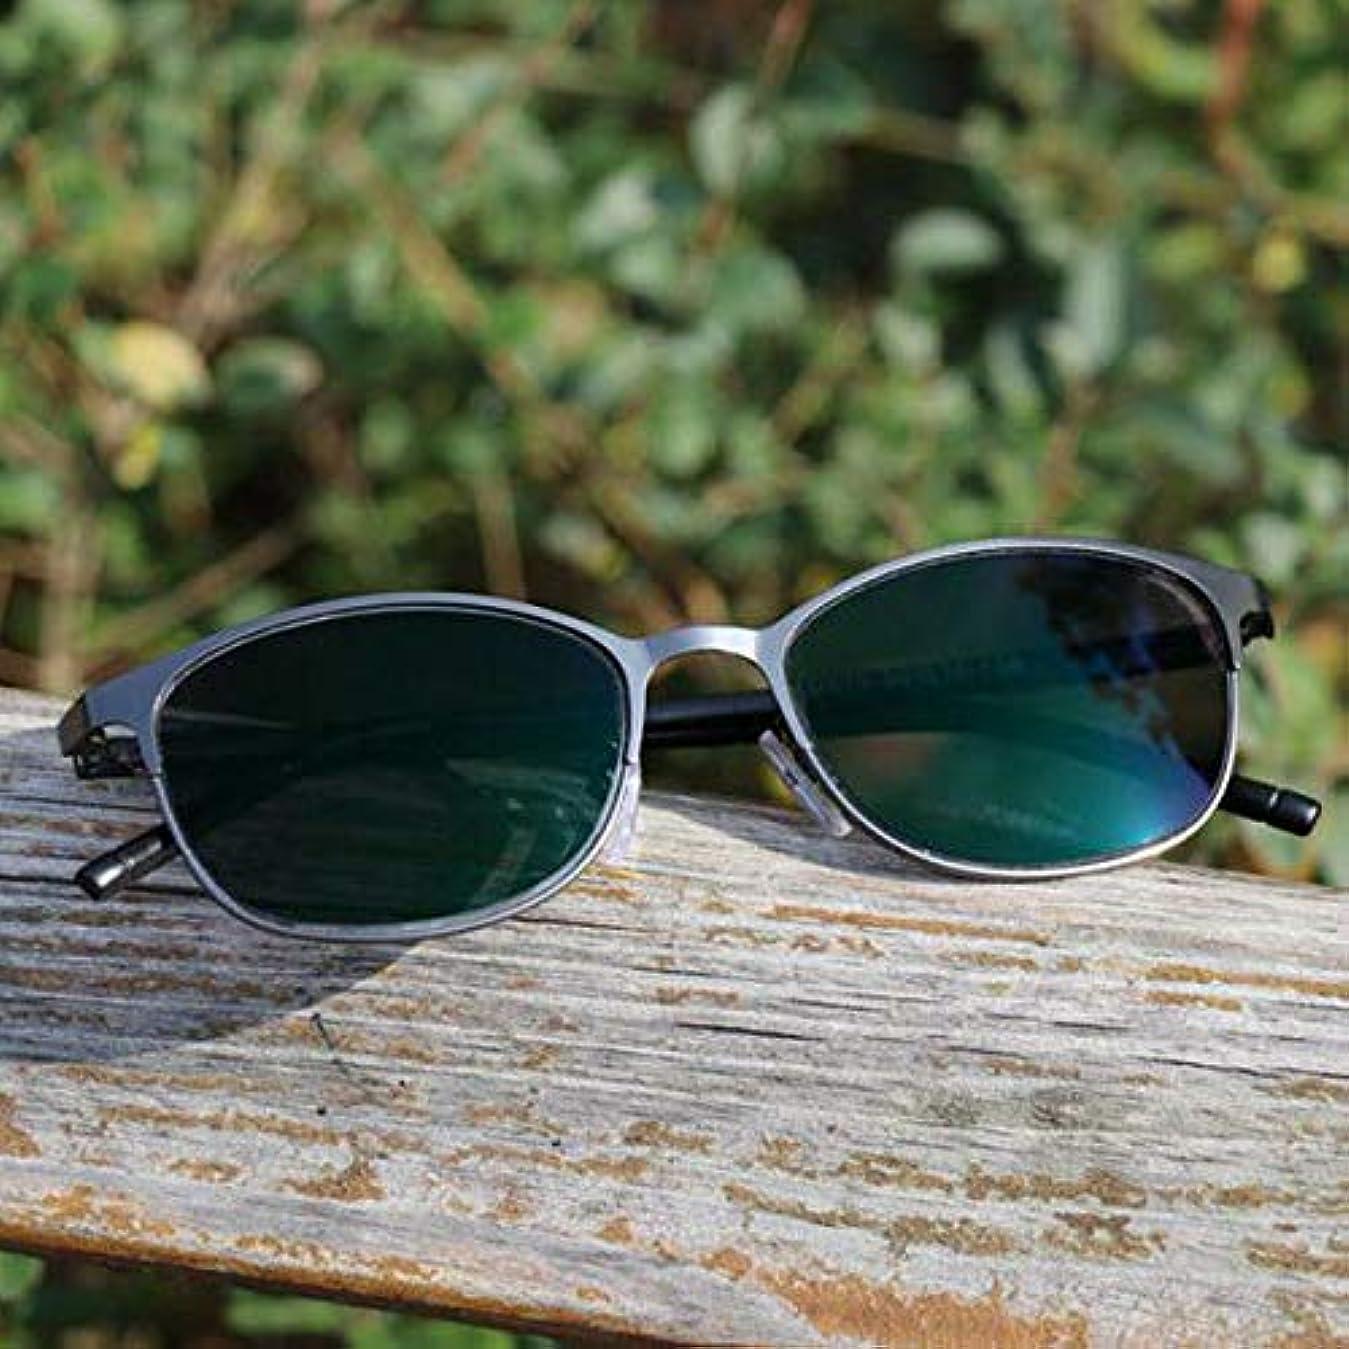 FidgetGear フォトクロミック老眼鏡眼鏡カラーチェンジレンズメタルフレームサングラス 赤